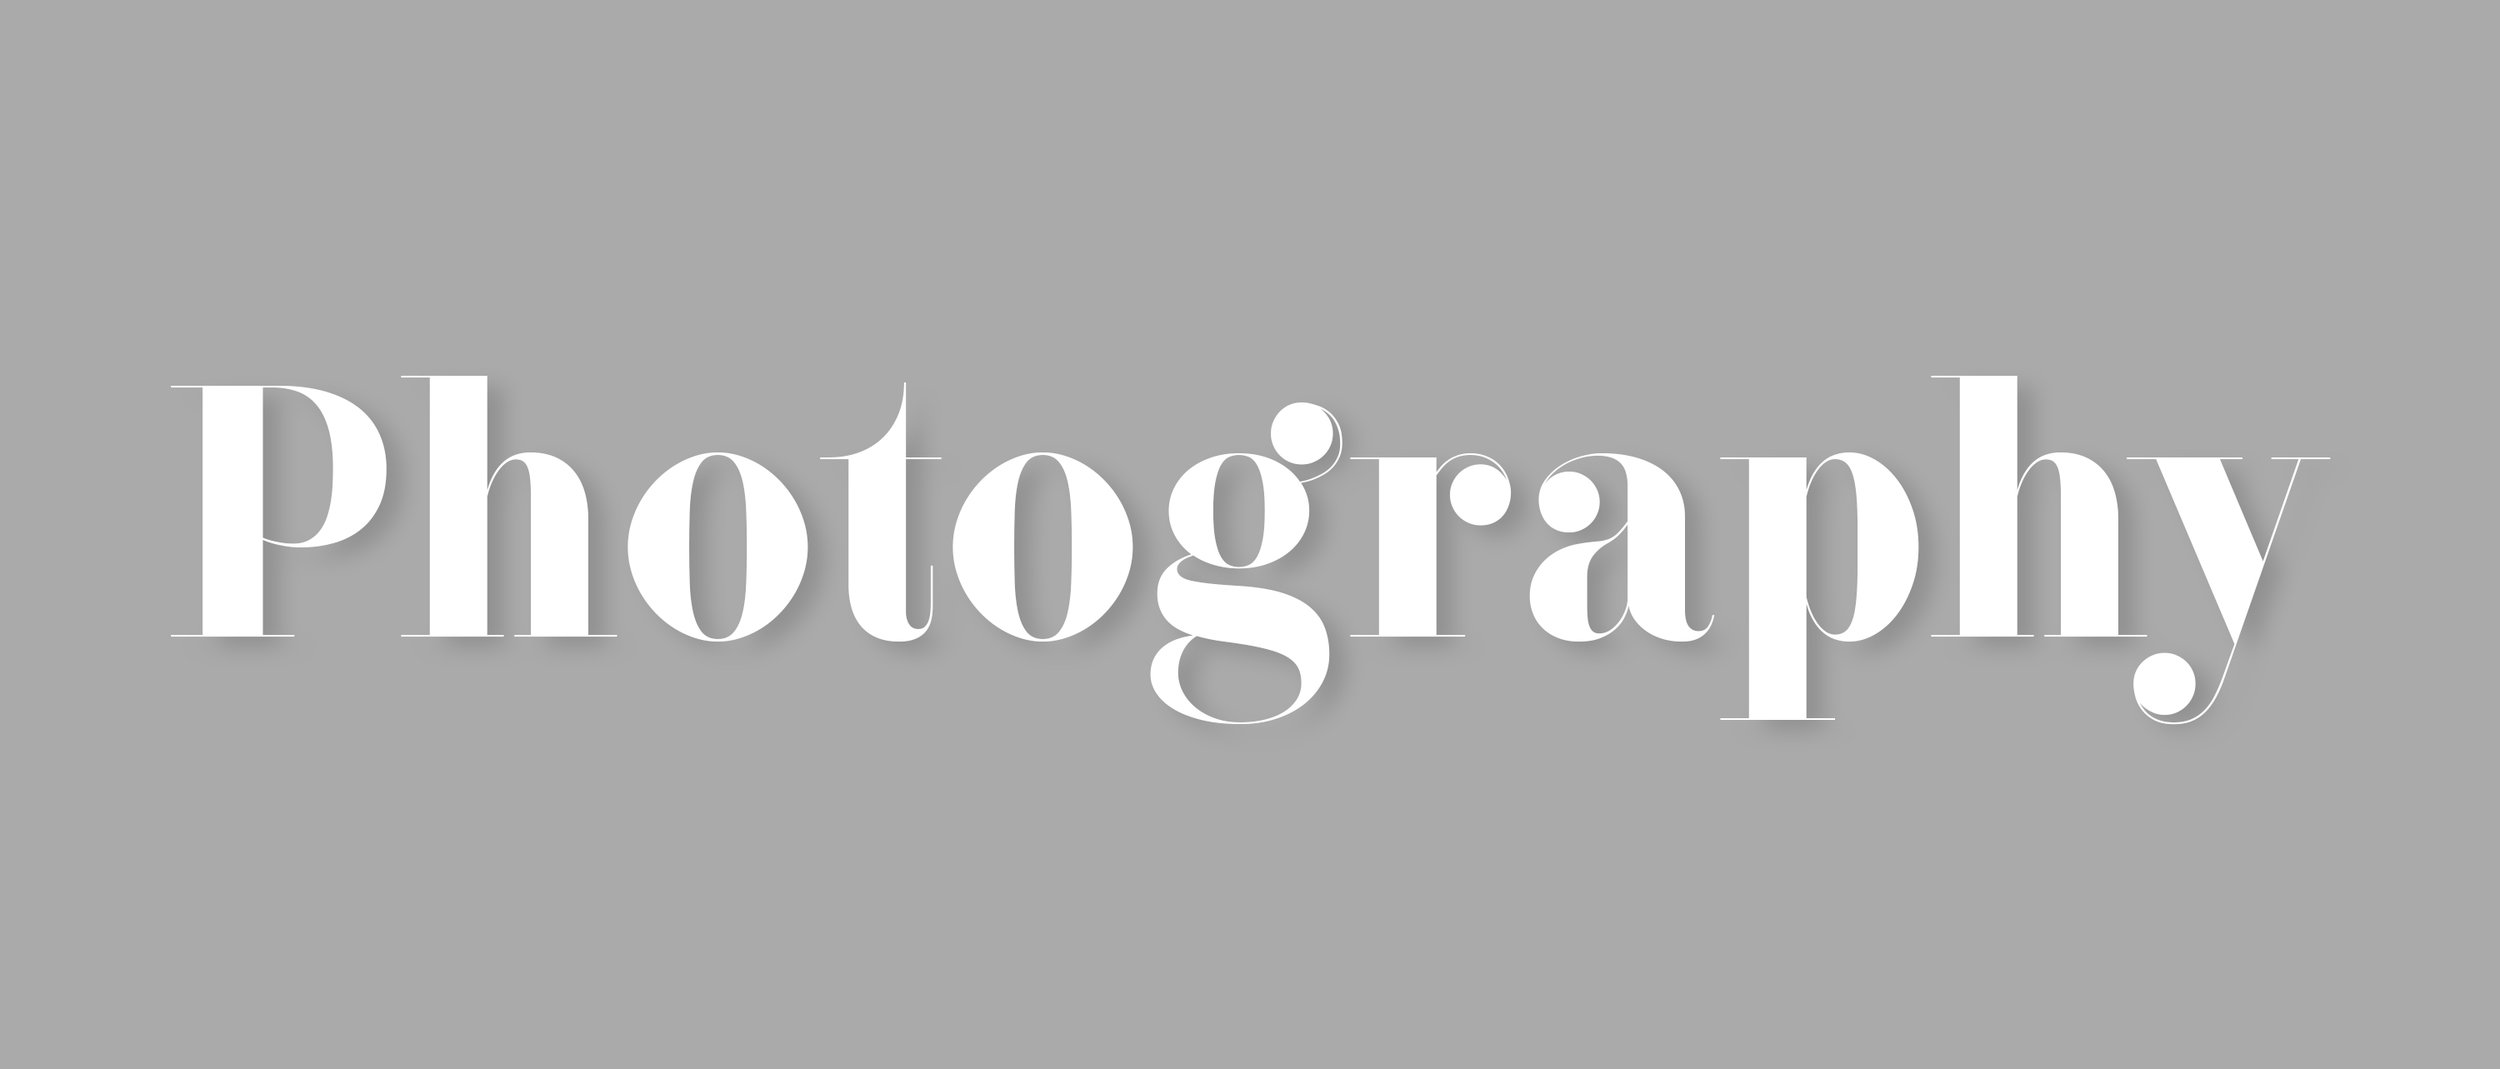 photography-3.jpg